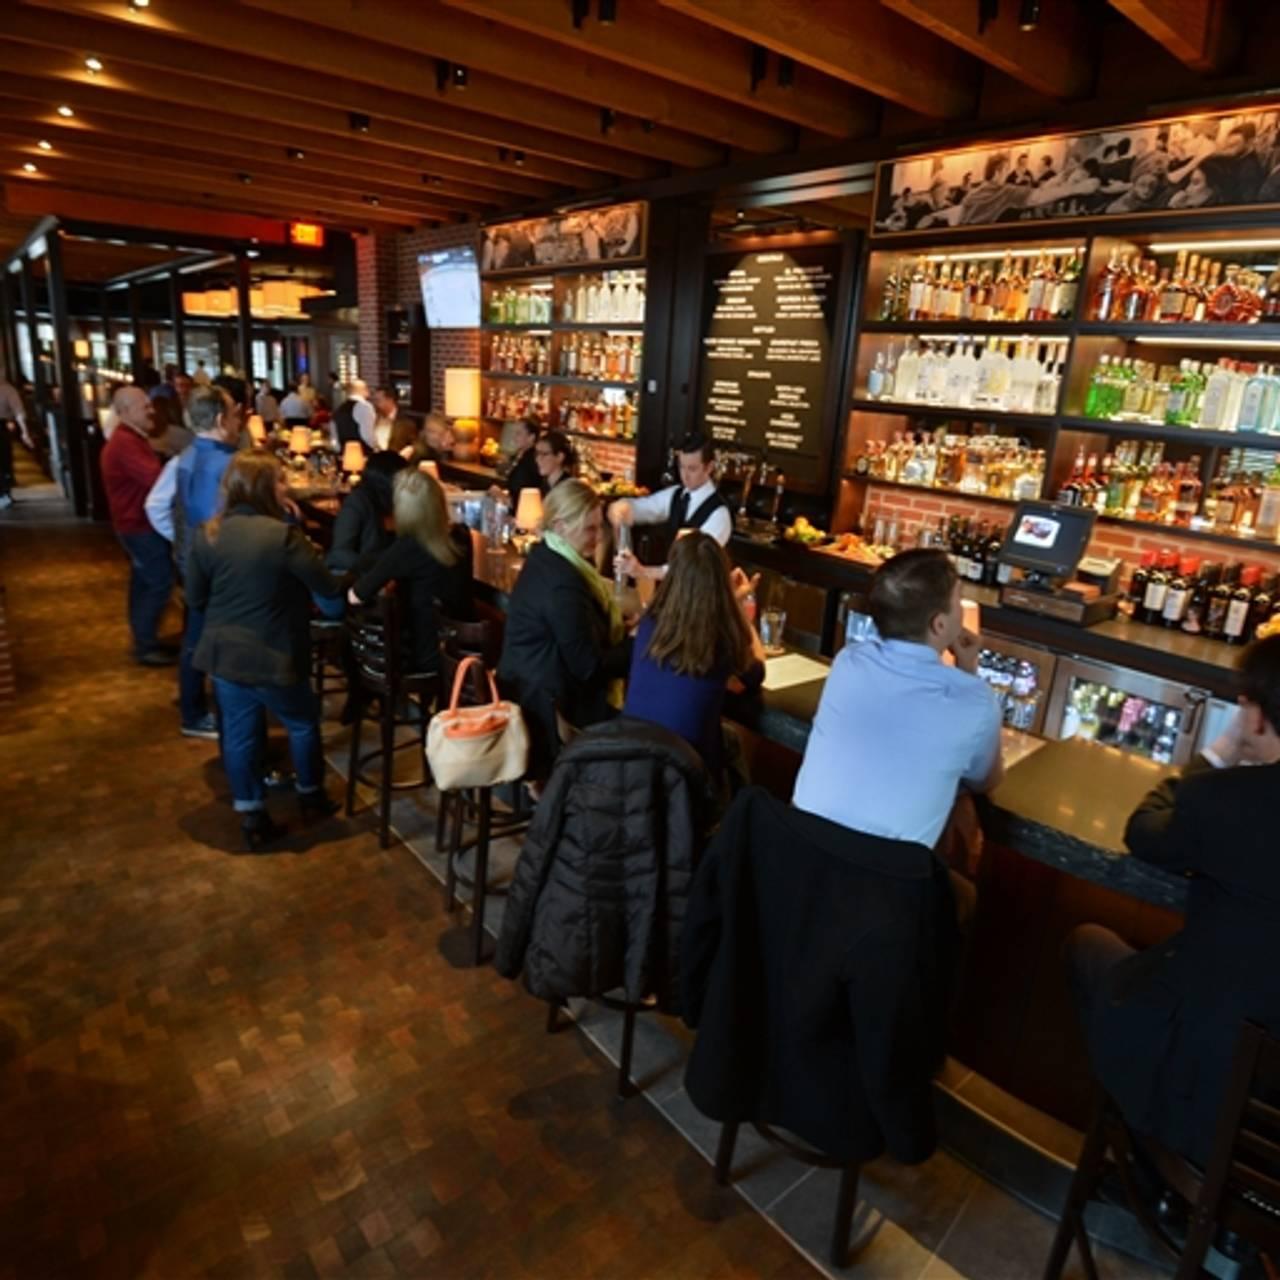 hudson 29 new albany restaurant new albany oh opentable rh opentable com hudson 29 new albany ohio hudson 29 new albany menu